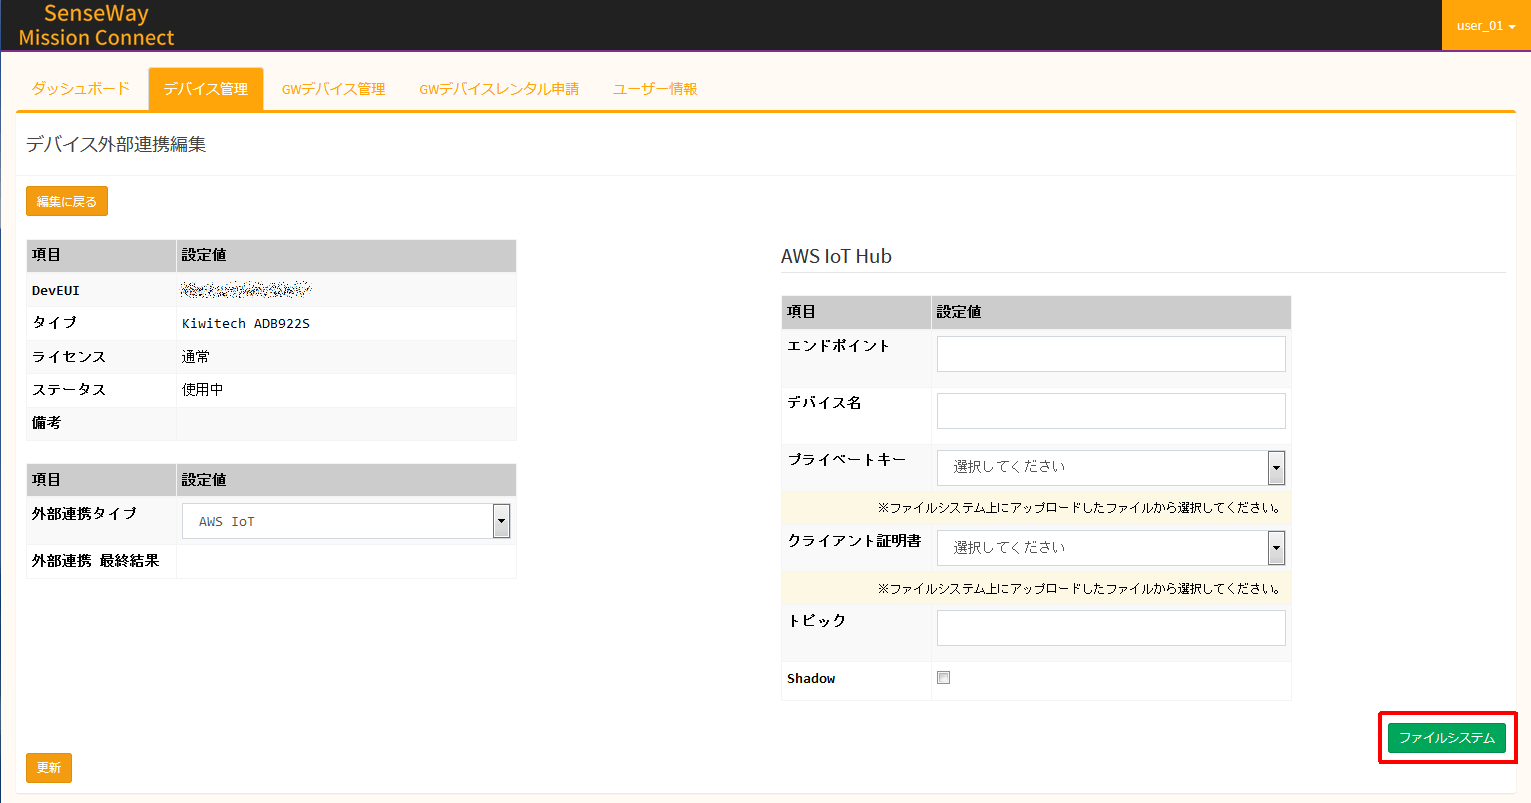 MissionConnect AWS Iot Edit